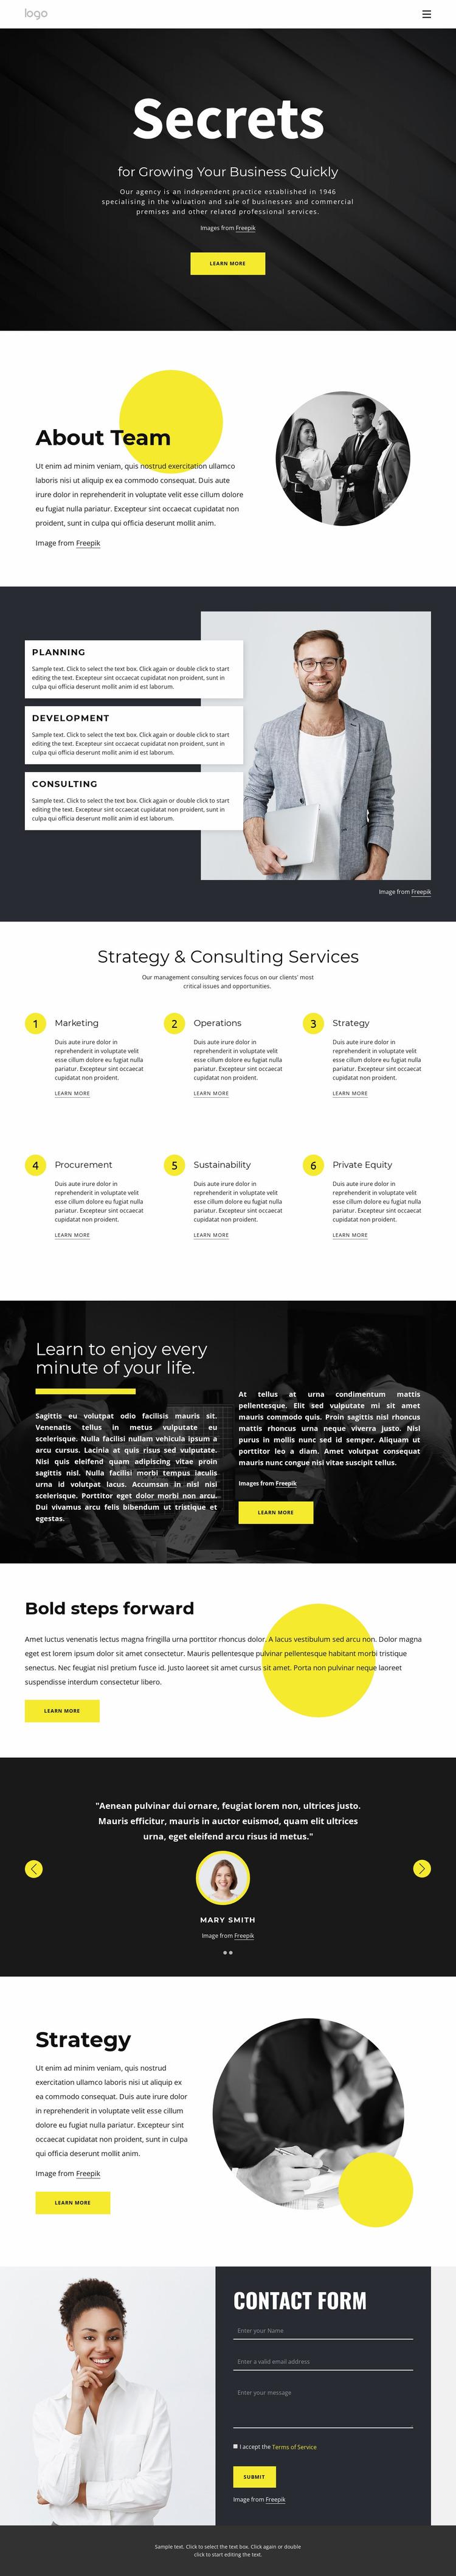 Secrets of growing business Website Mockup